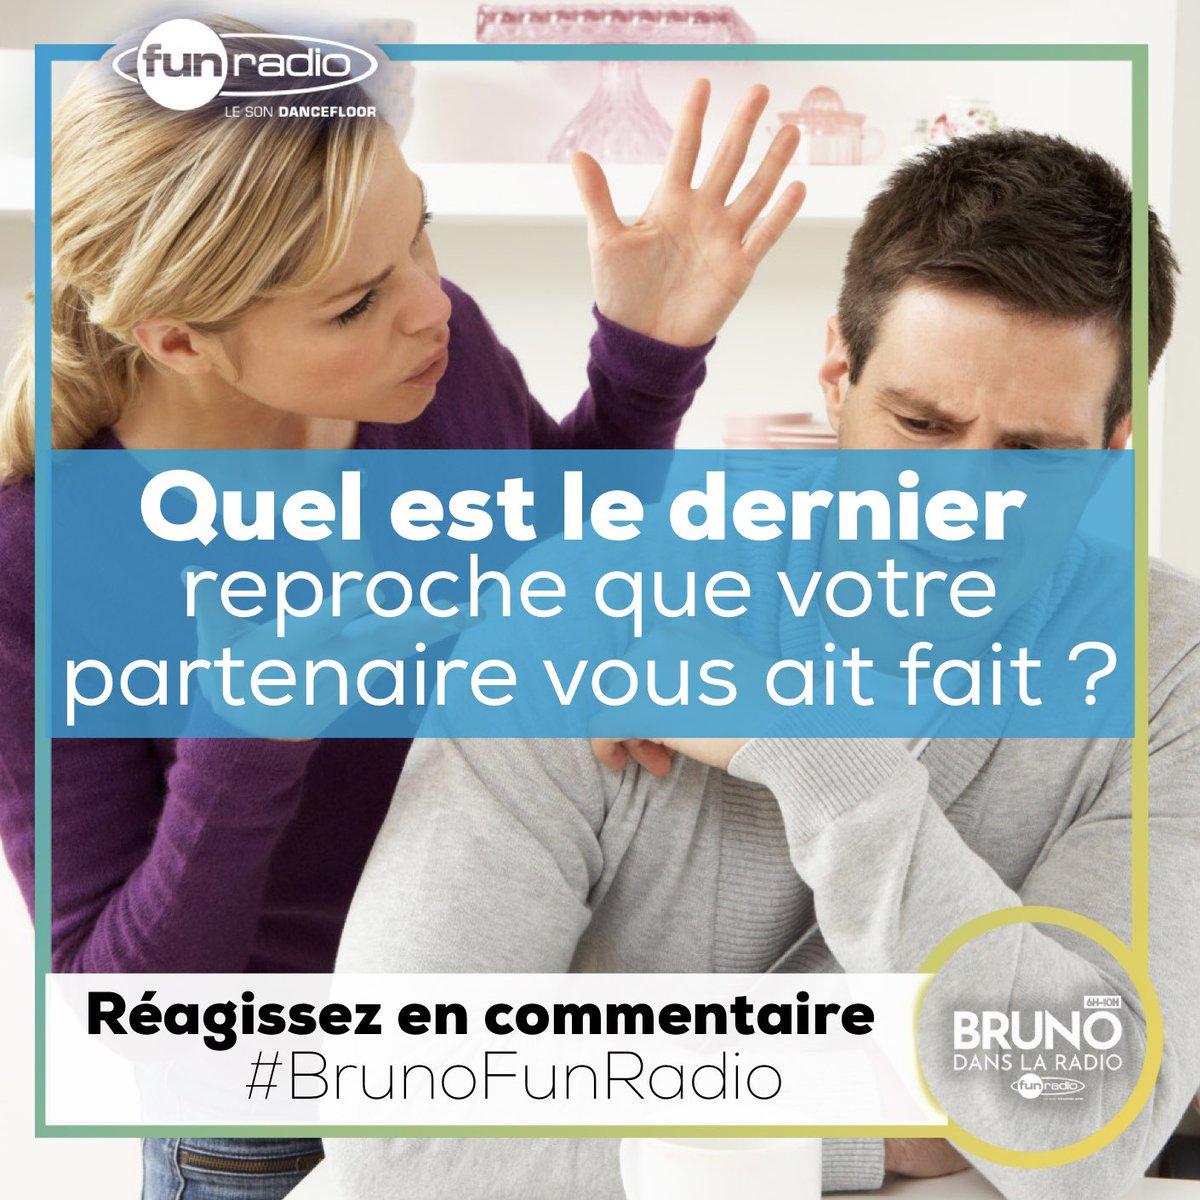 On en parle dans les commentaires !  #brunofunradio <br>http://pic.twitter.com/1efpGbjPLn